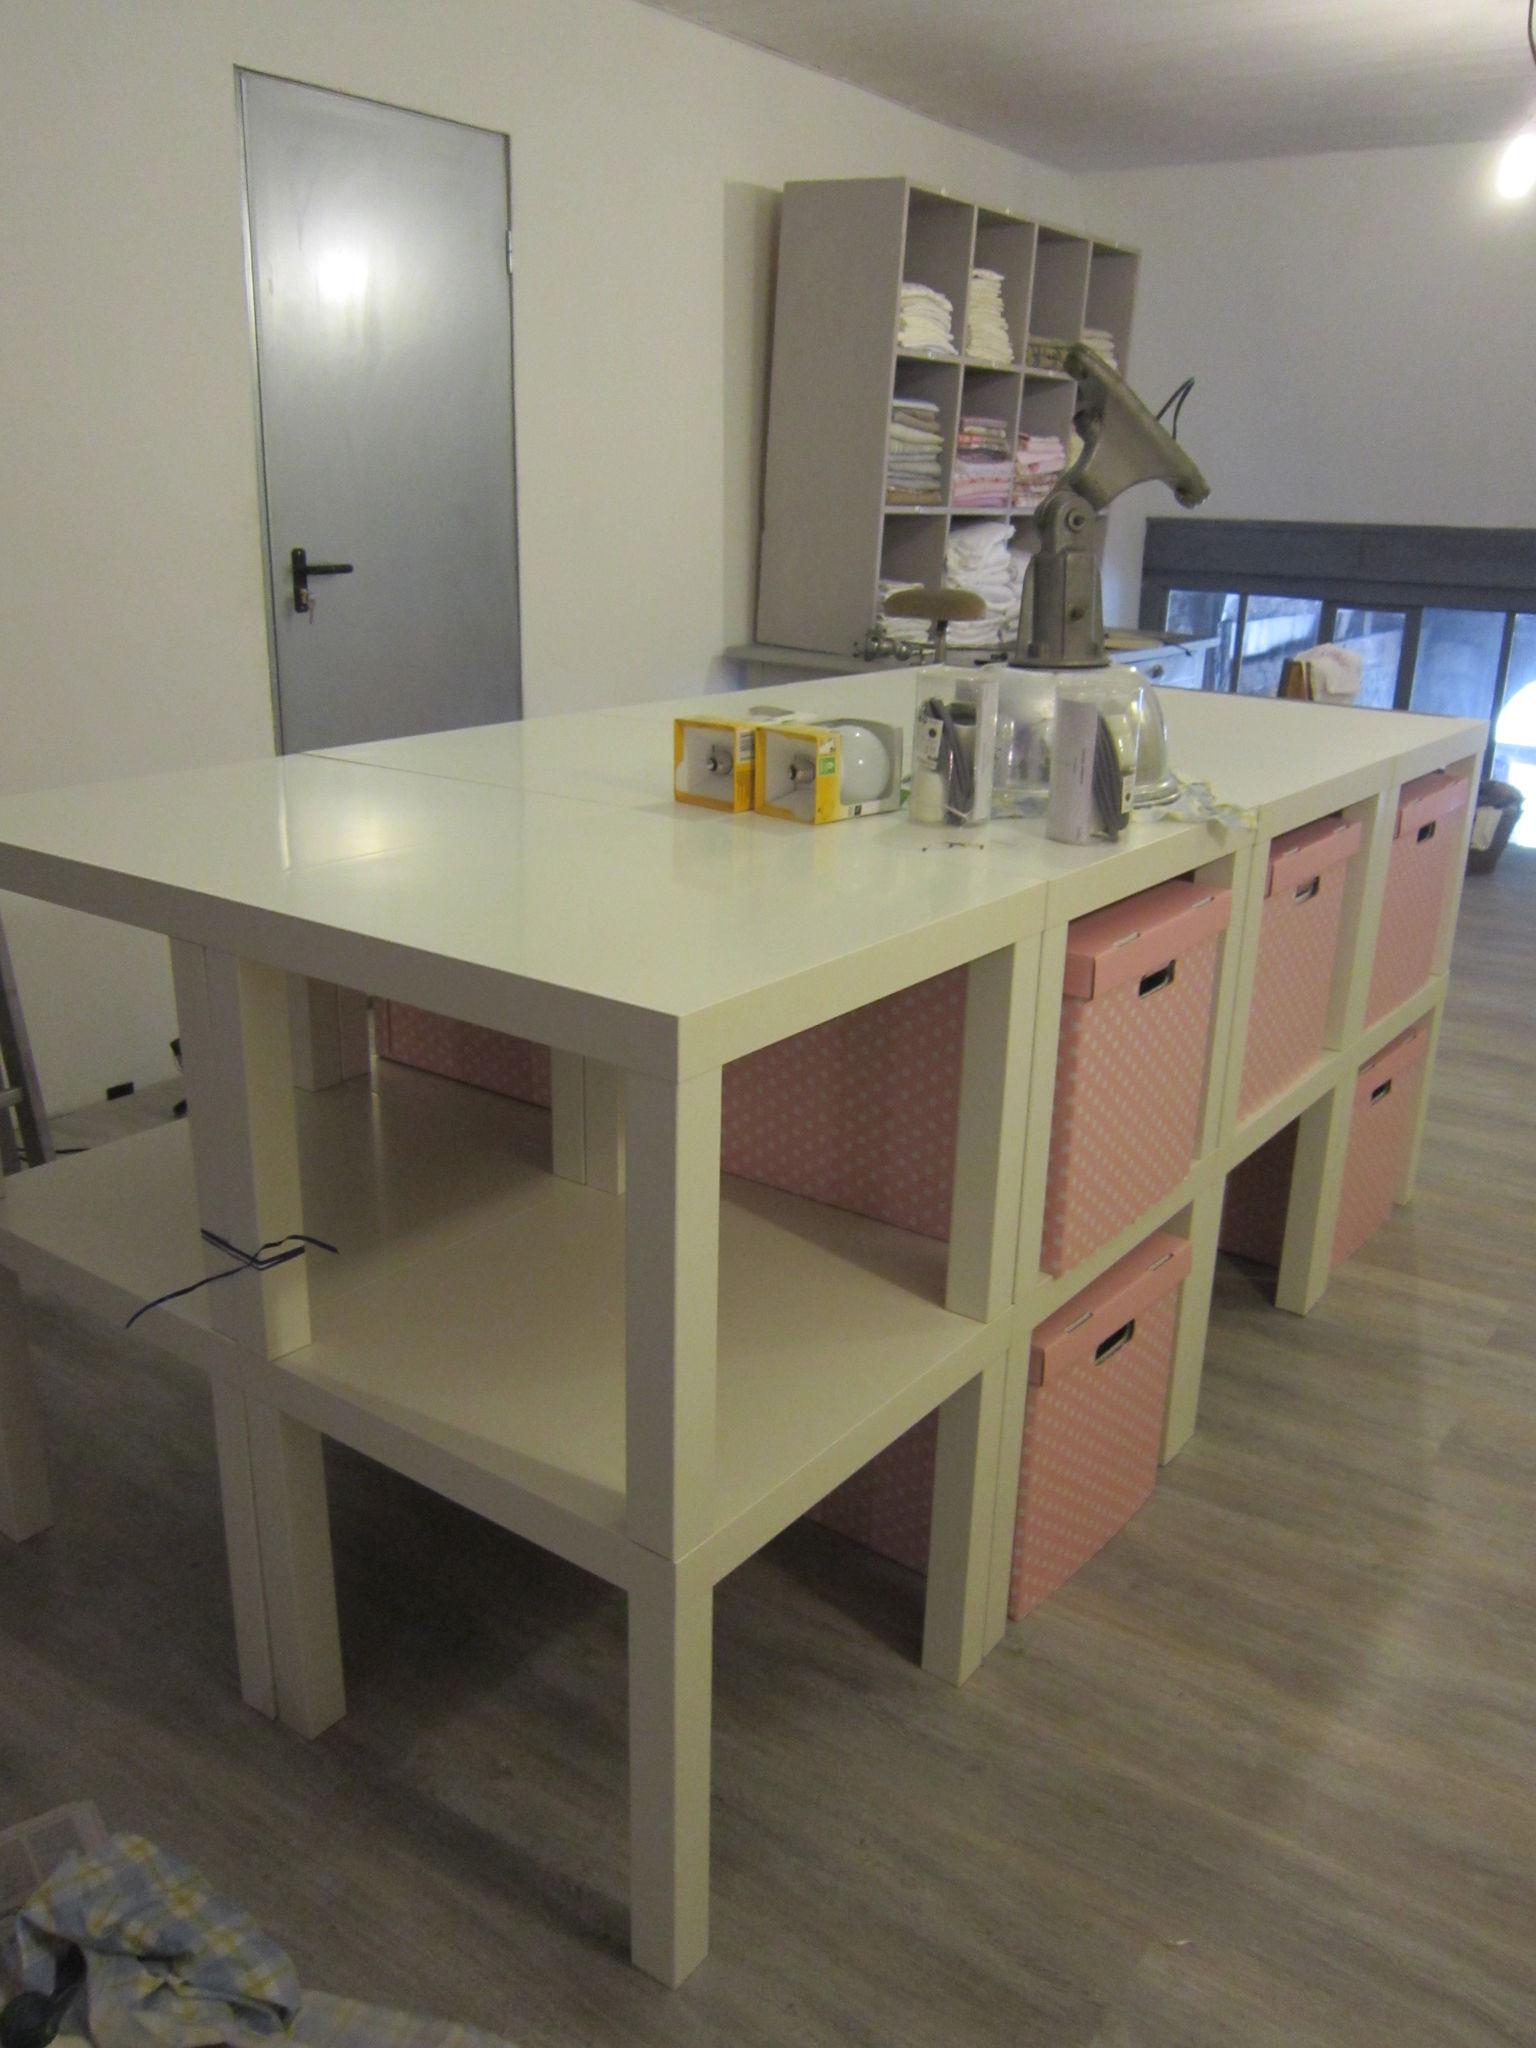 Diy ikea hack mesa auxiliar lack blog tienda - Ikea mesas auxiliares ...